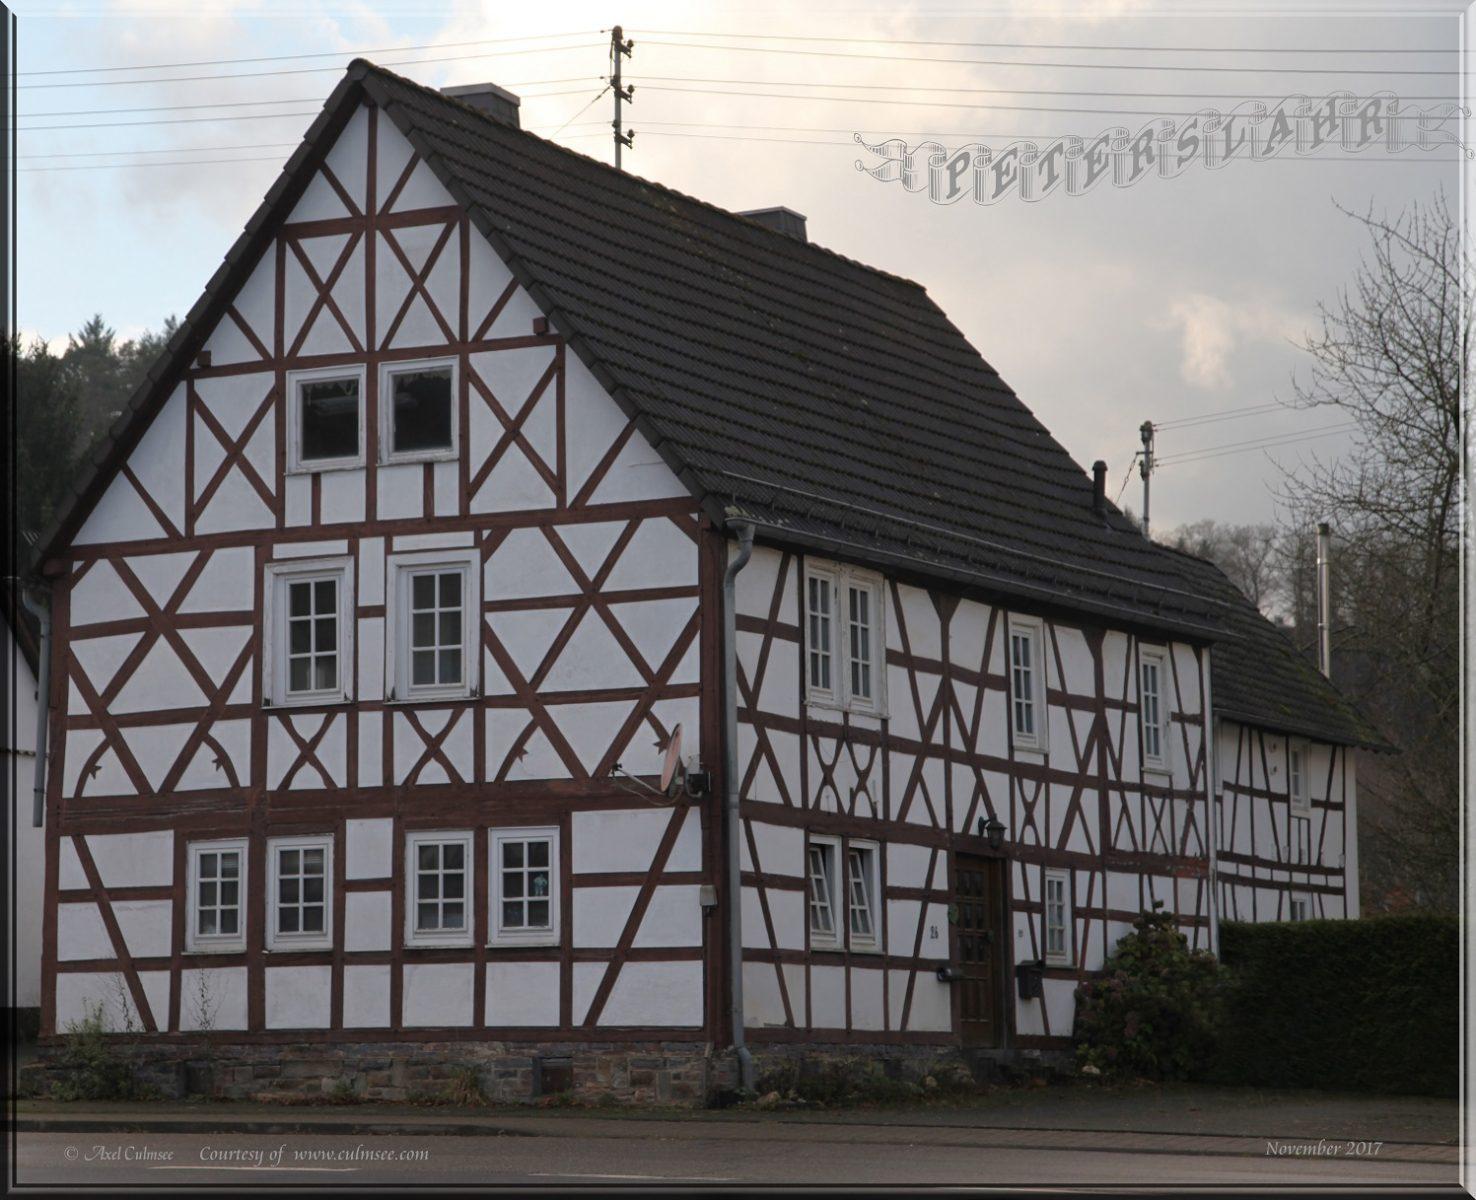 Peterslahr Fachwerkhaus 18th century